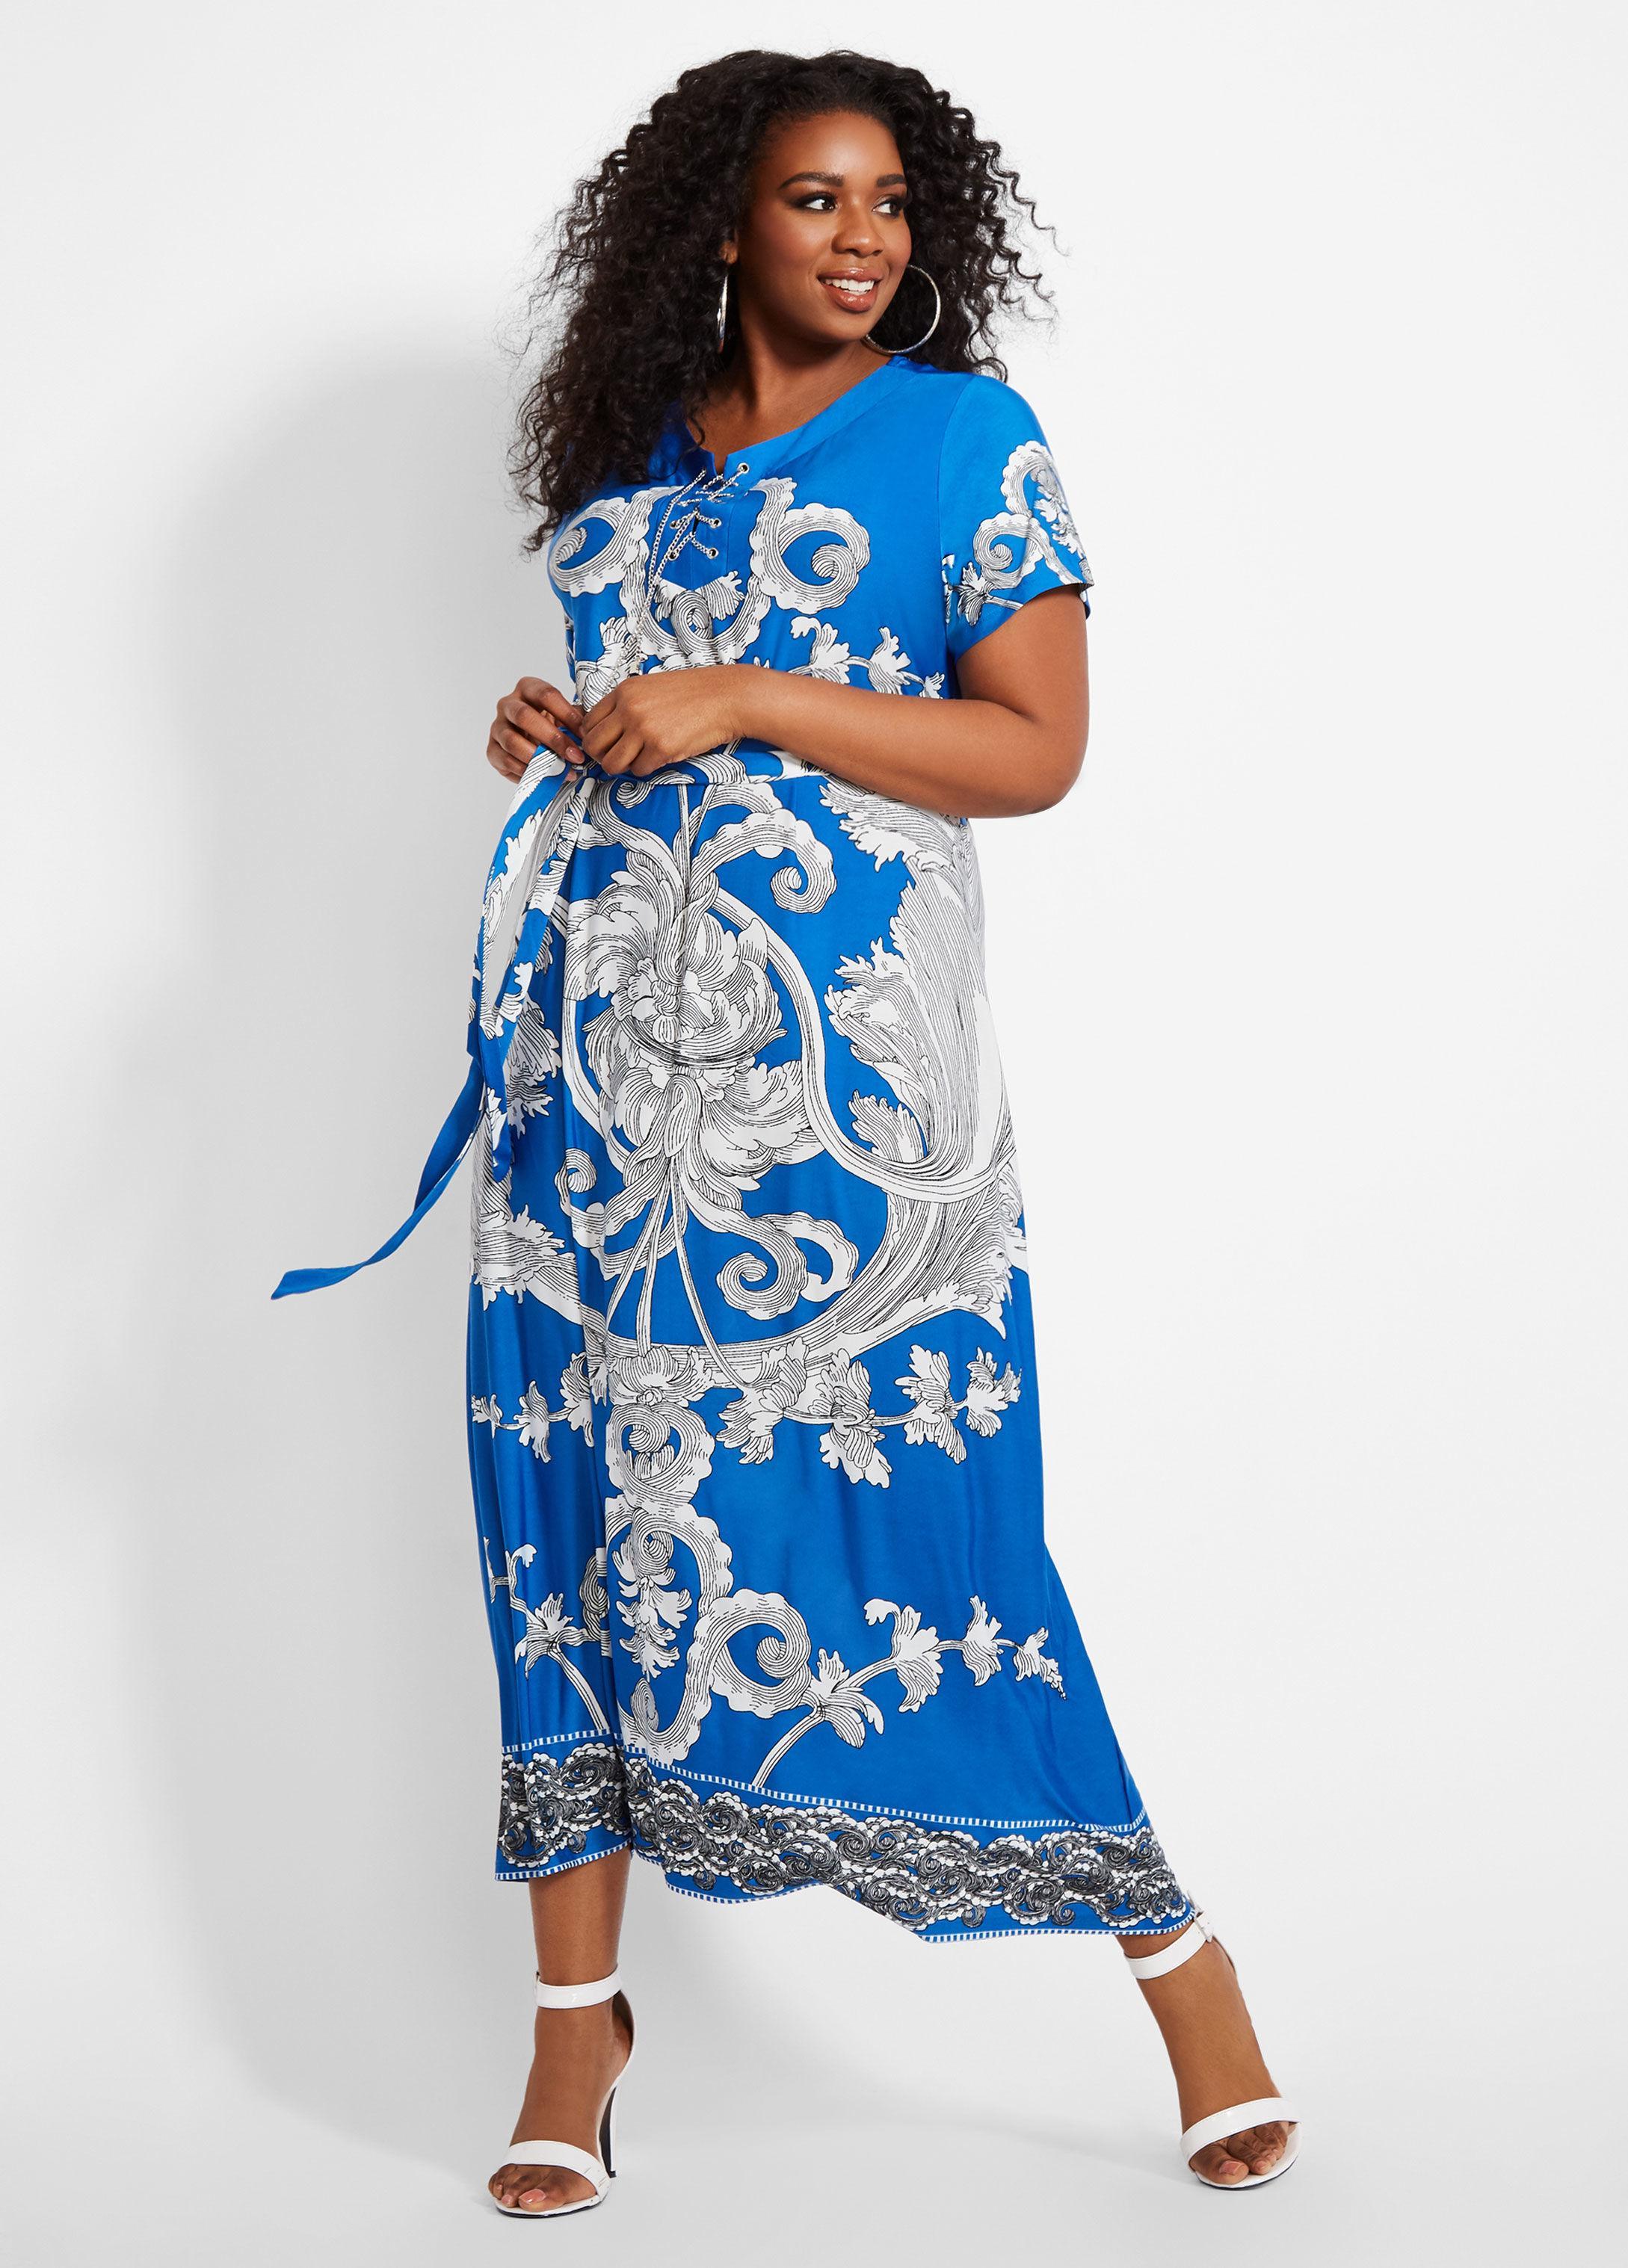 98b2d7b5d6f1 Lyst - Ashley Stewart Plus Size Chain Lace Up Printed Maxi Dress in Blue